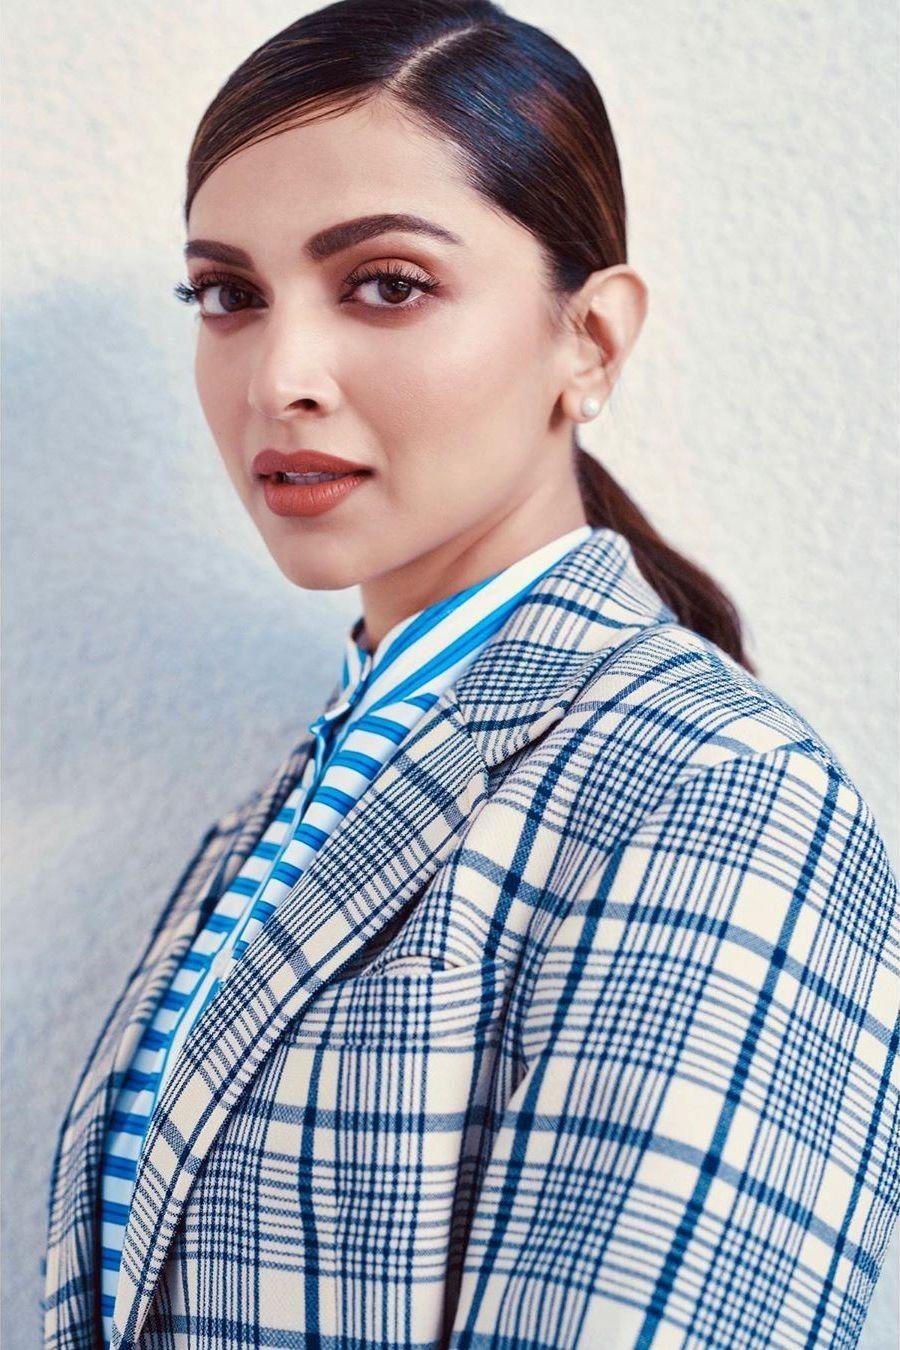 Pin By Anika Murad On Deepika Padukone In 2020 Deepika Padukone Style Bollywood Celebrities Deepika Padukone